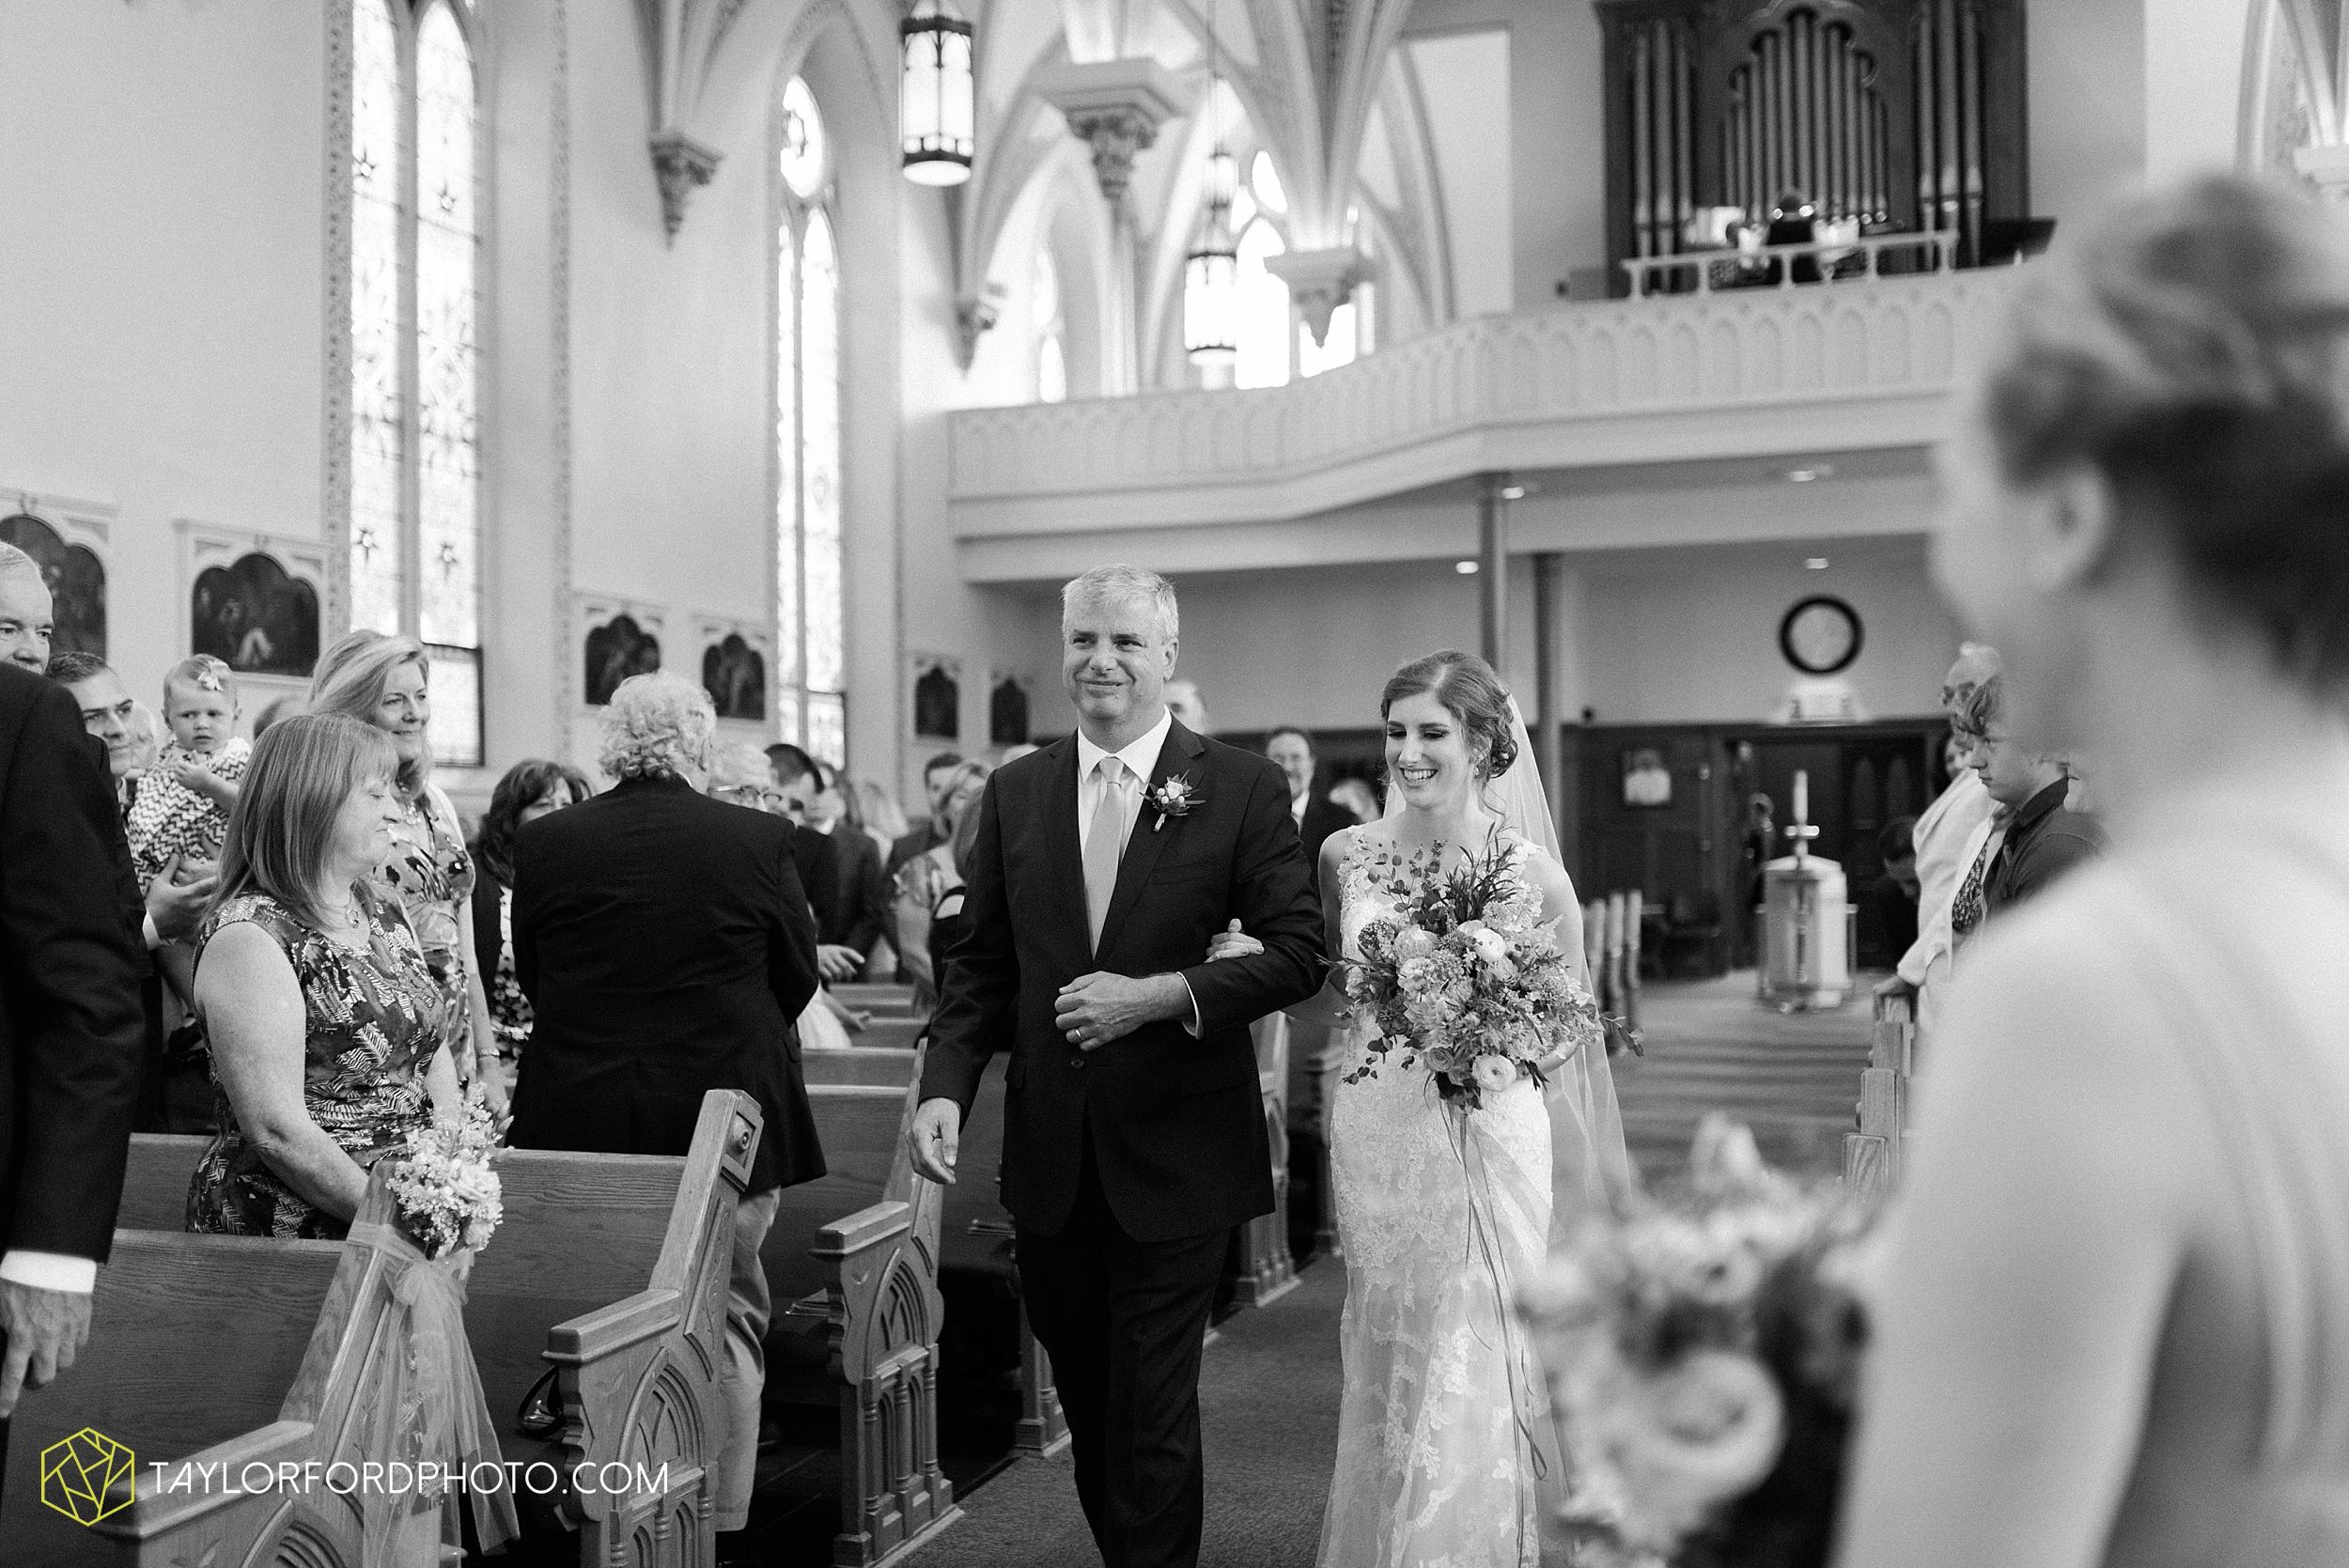 getting married in toledo ohio